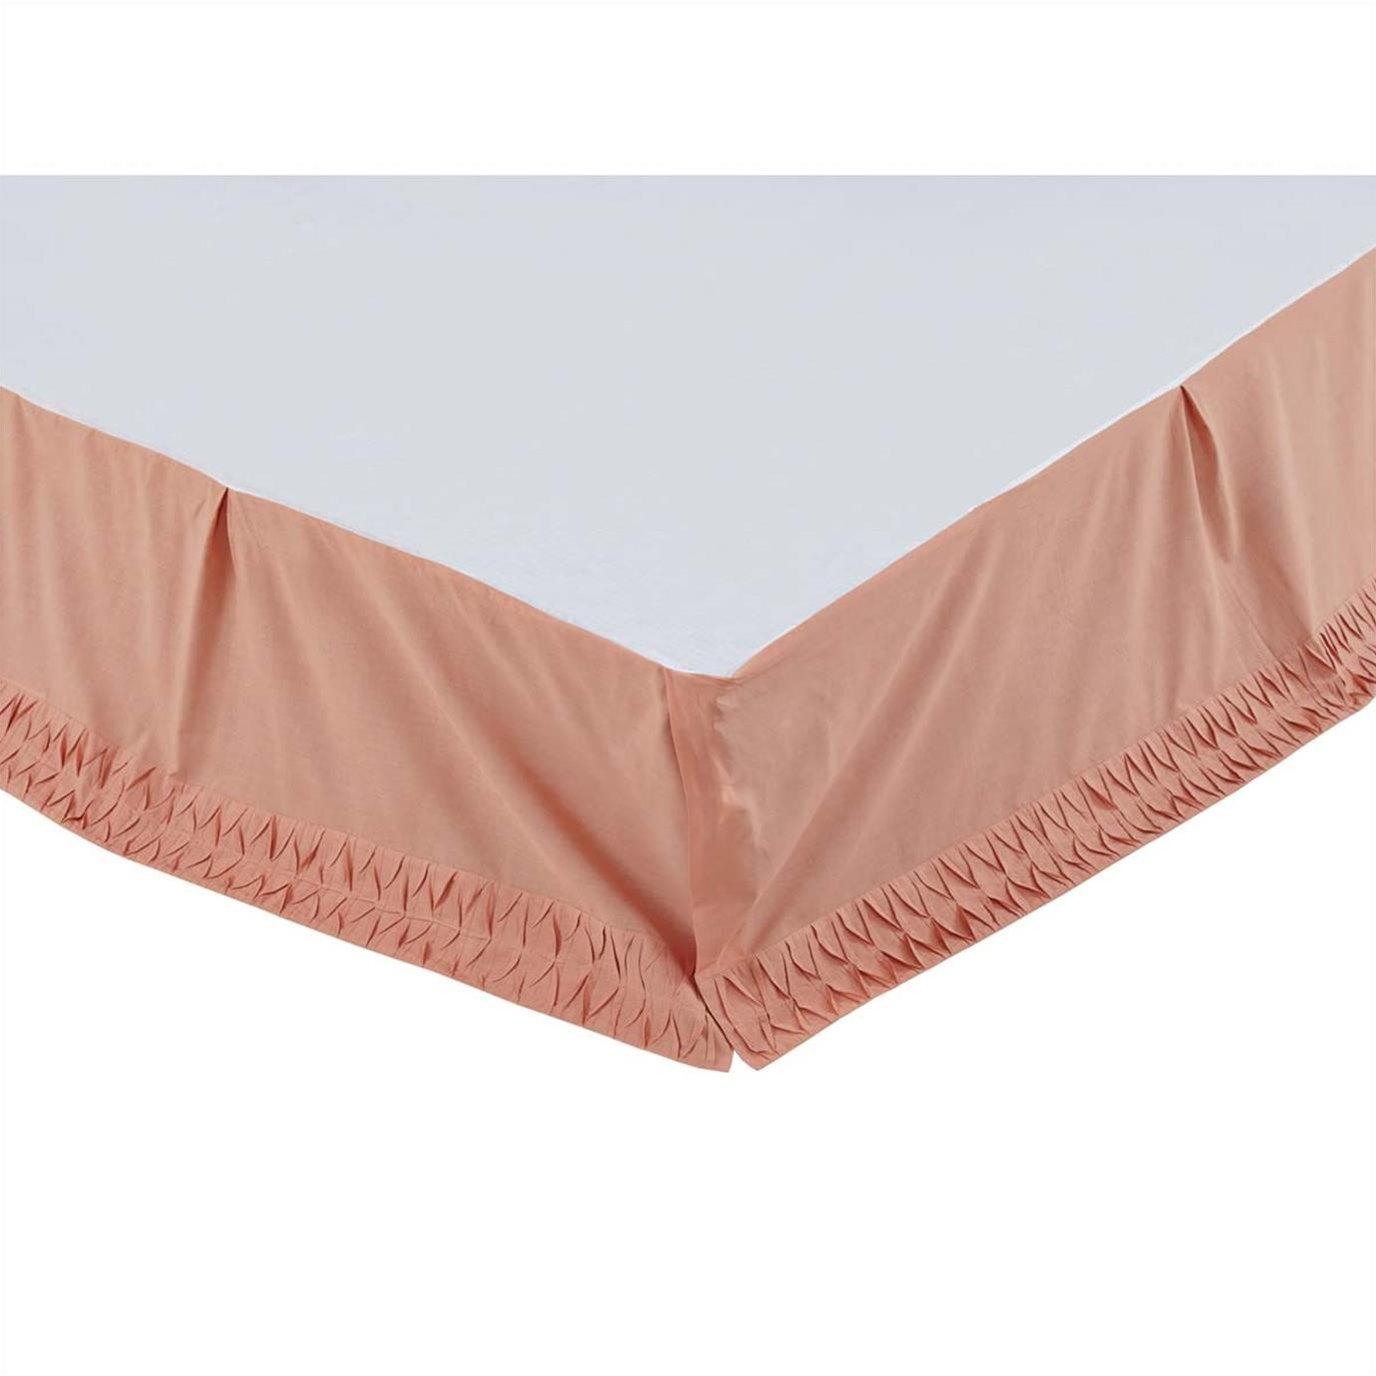 Adelia Apricot Twin Bed Skirt 39x76x16